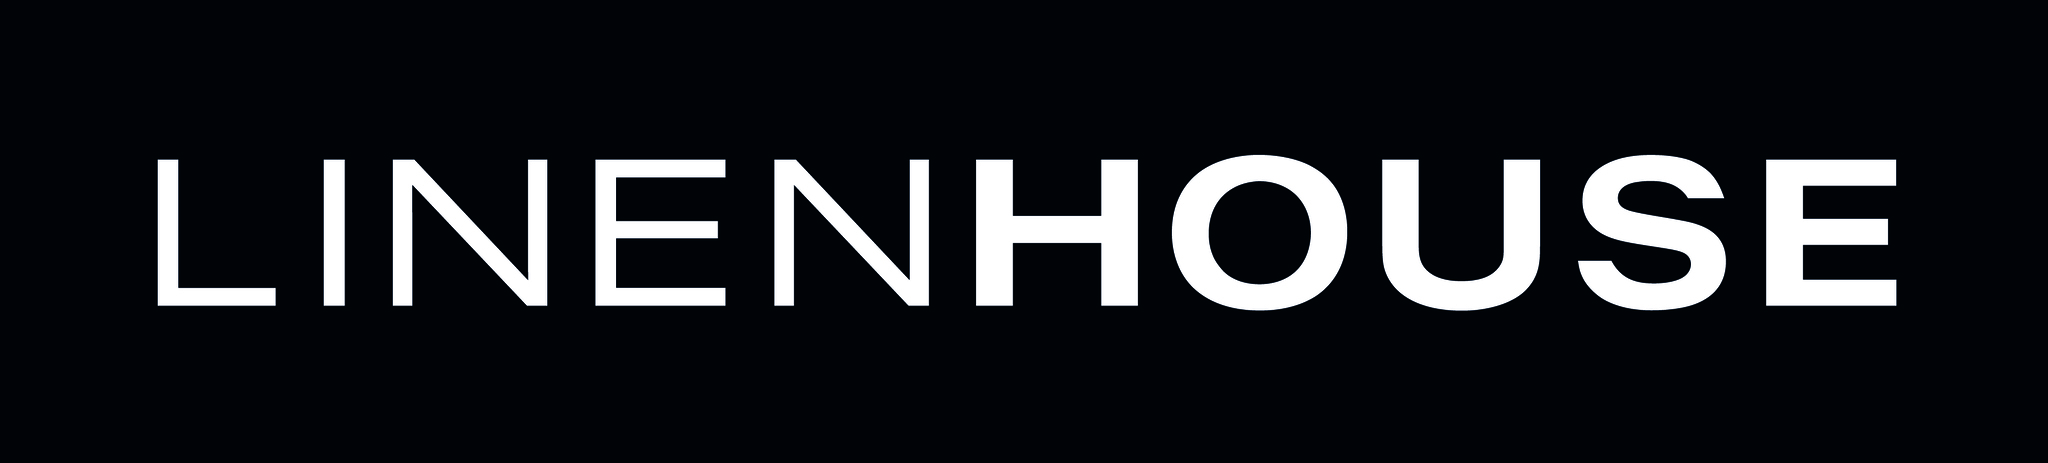 Linenhouse logo